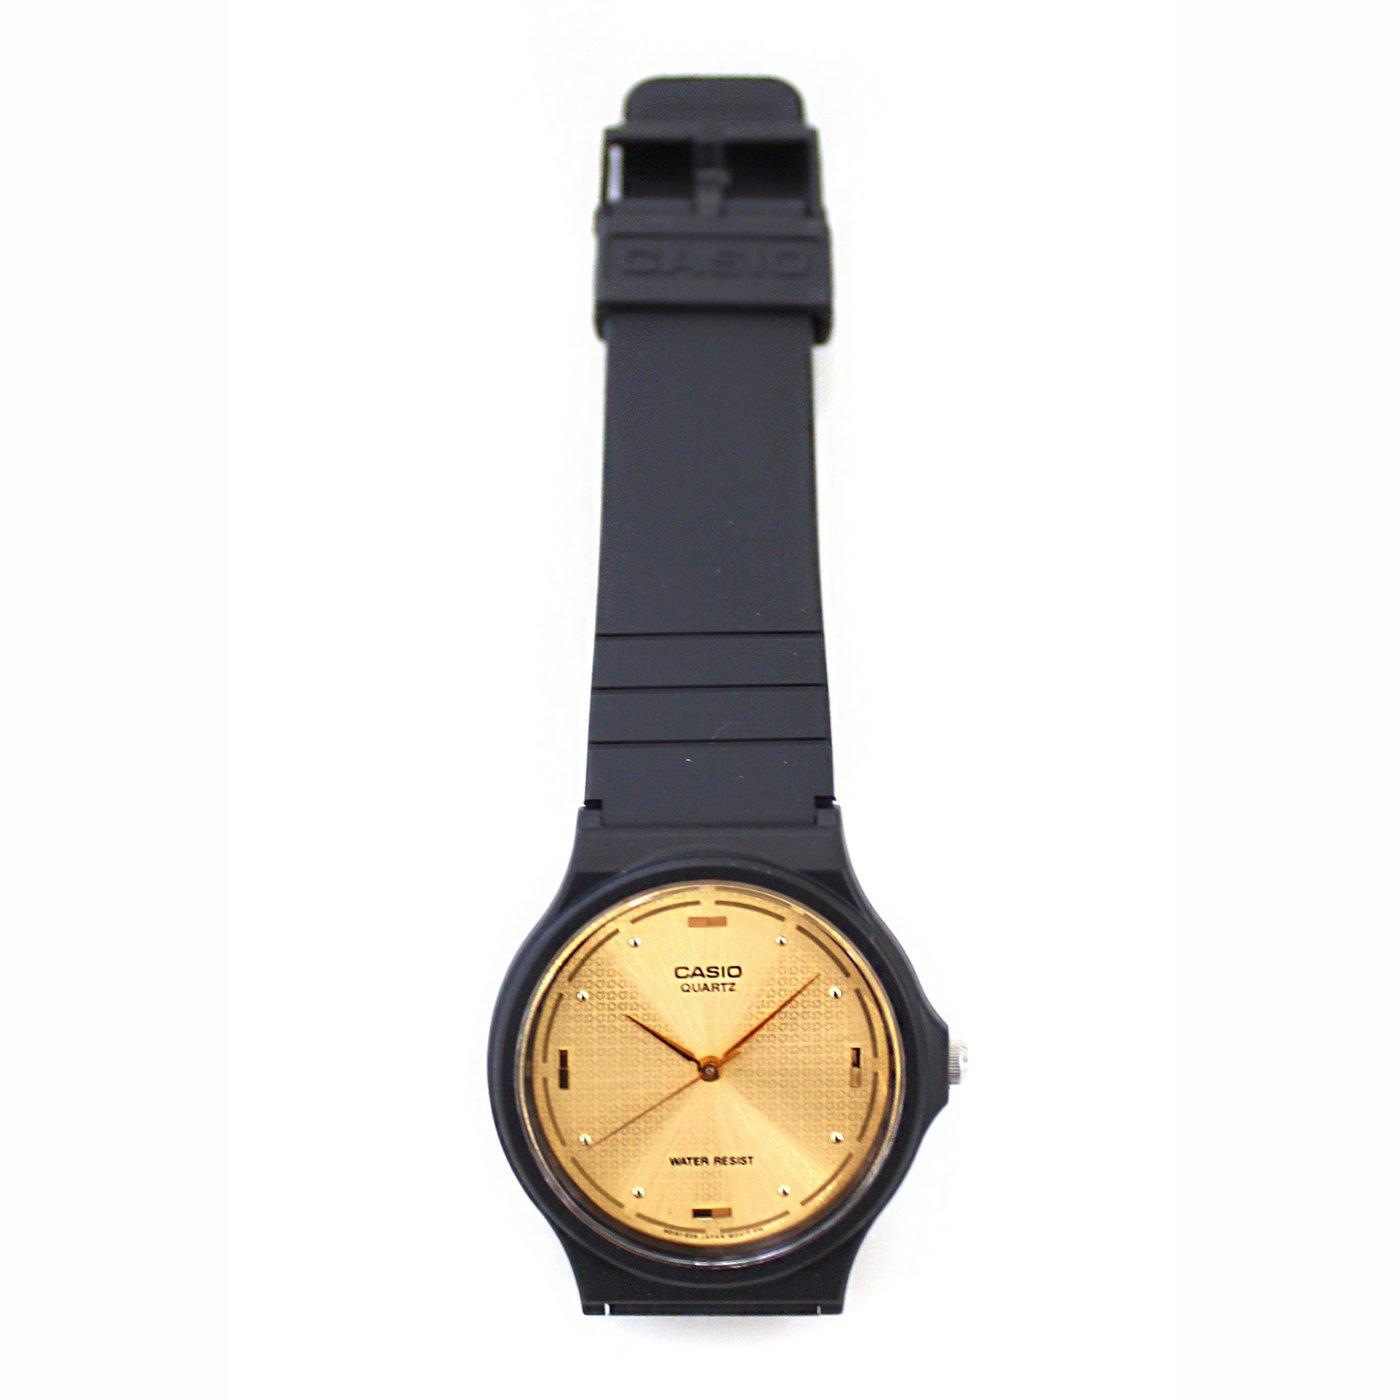 IEDIT[イディット] SELECT CASIO アナログ腕時計 ラウンド MQ-76-9A〈ブラック×ゴールド〉